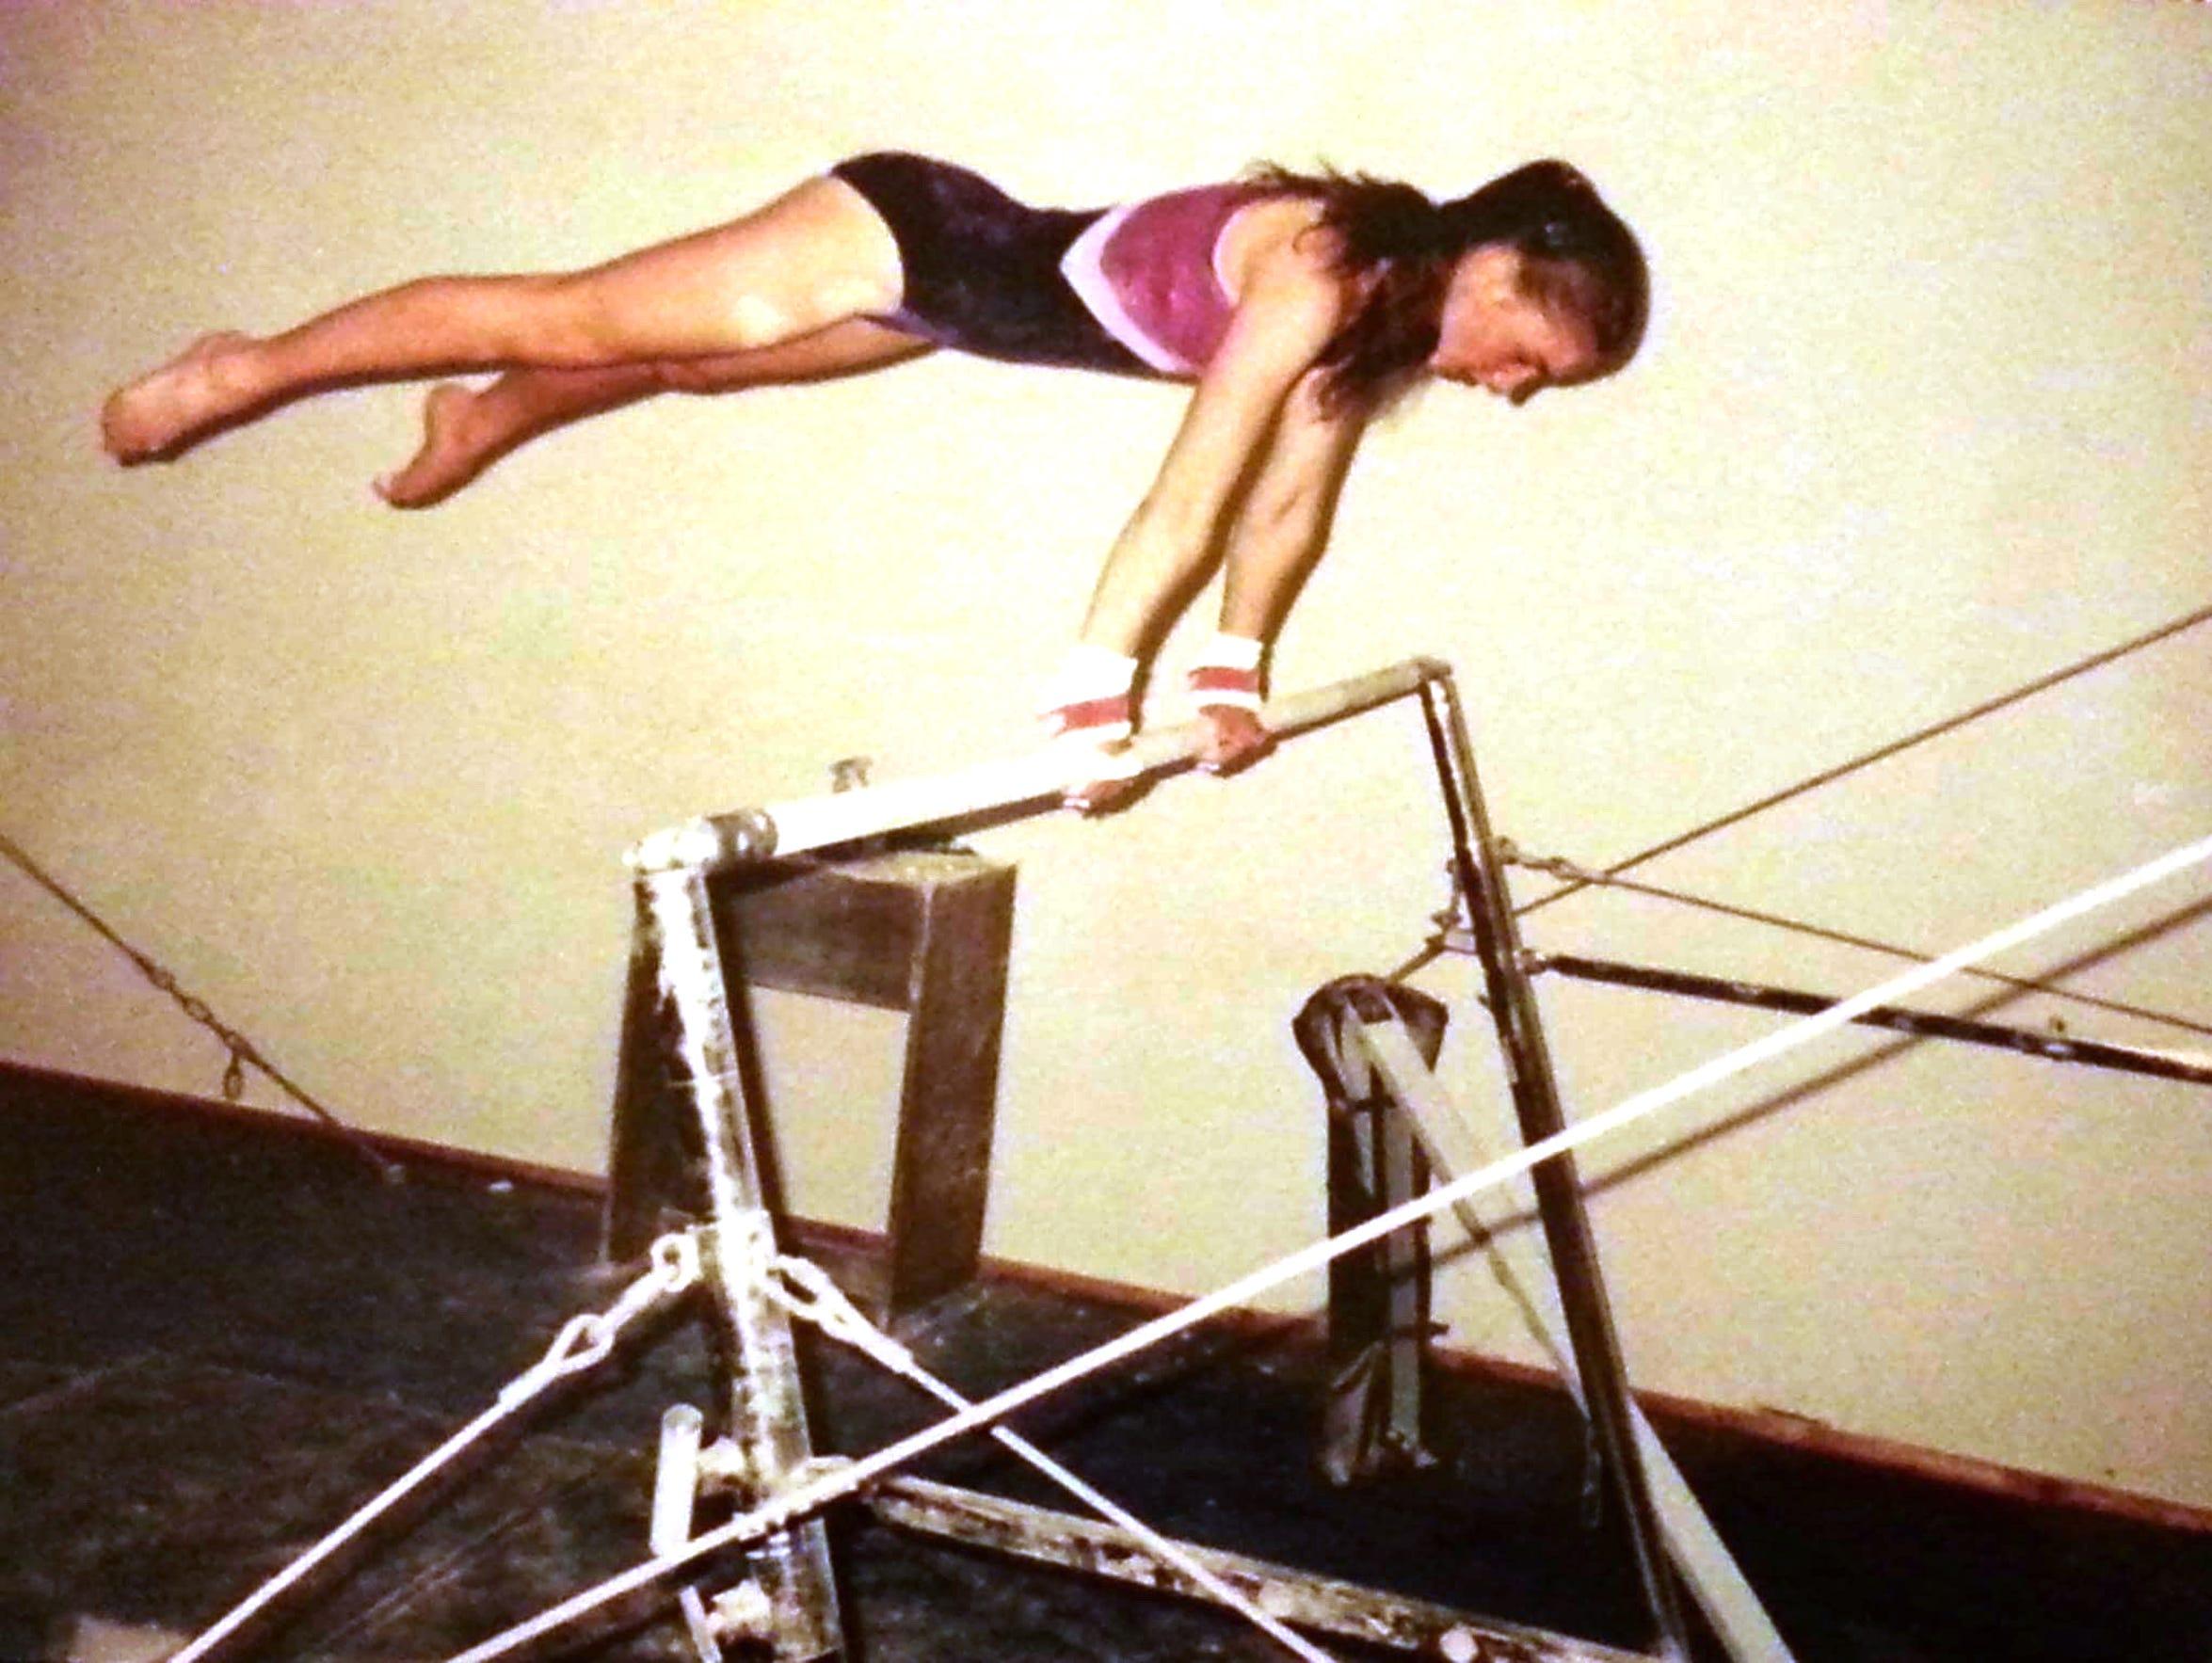 2000: Nassar digitally penetrates 15-year-old gymnast